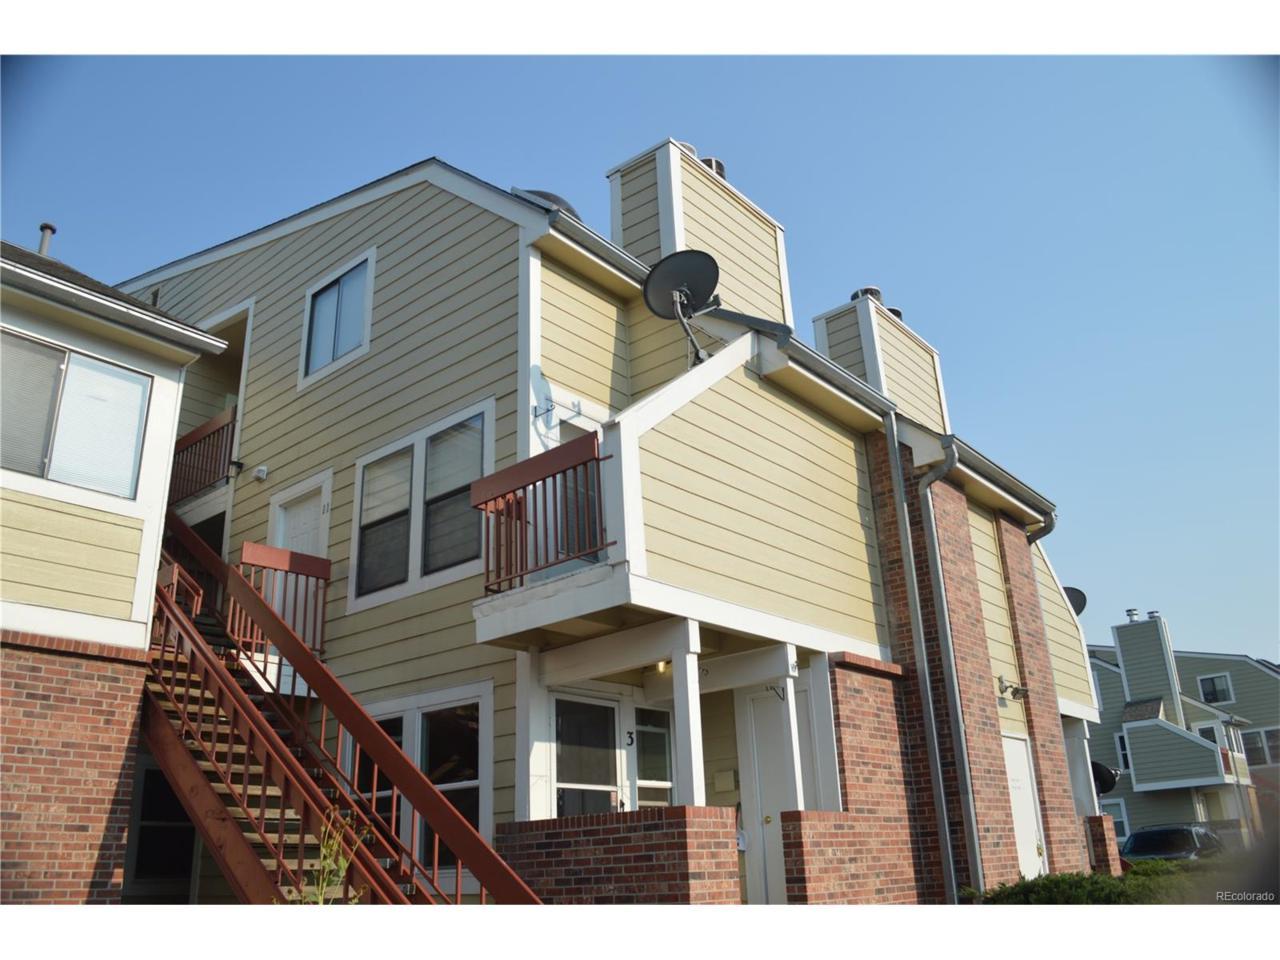 942 S Dearborn Way #11, Aurora, CO 80012 (MLS #3091837) :: 8z Real Estate